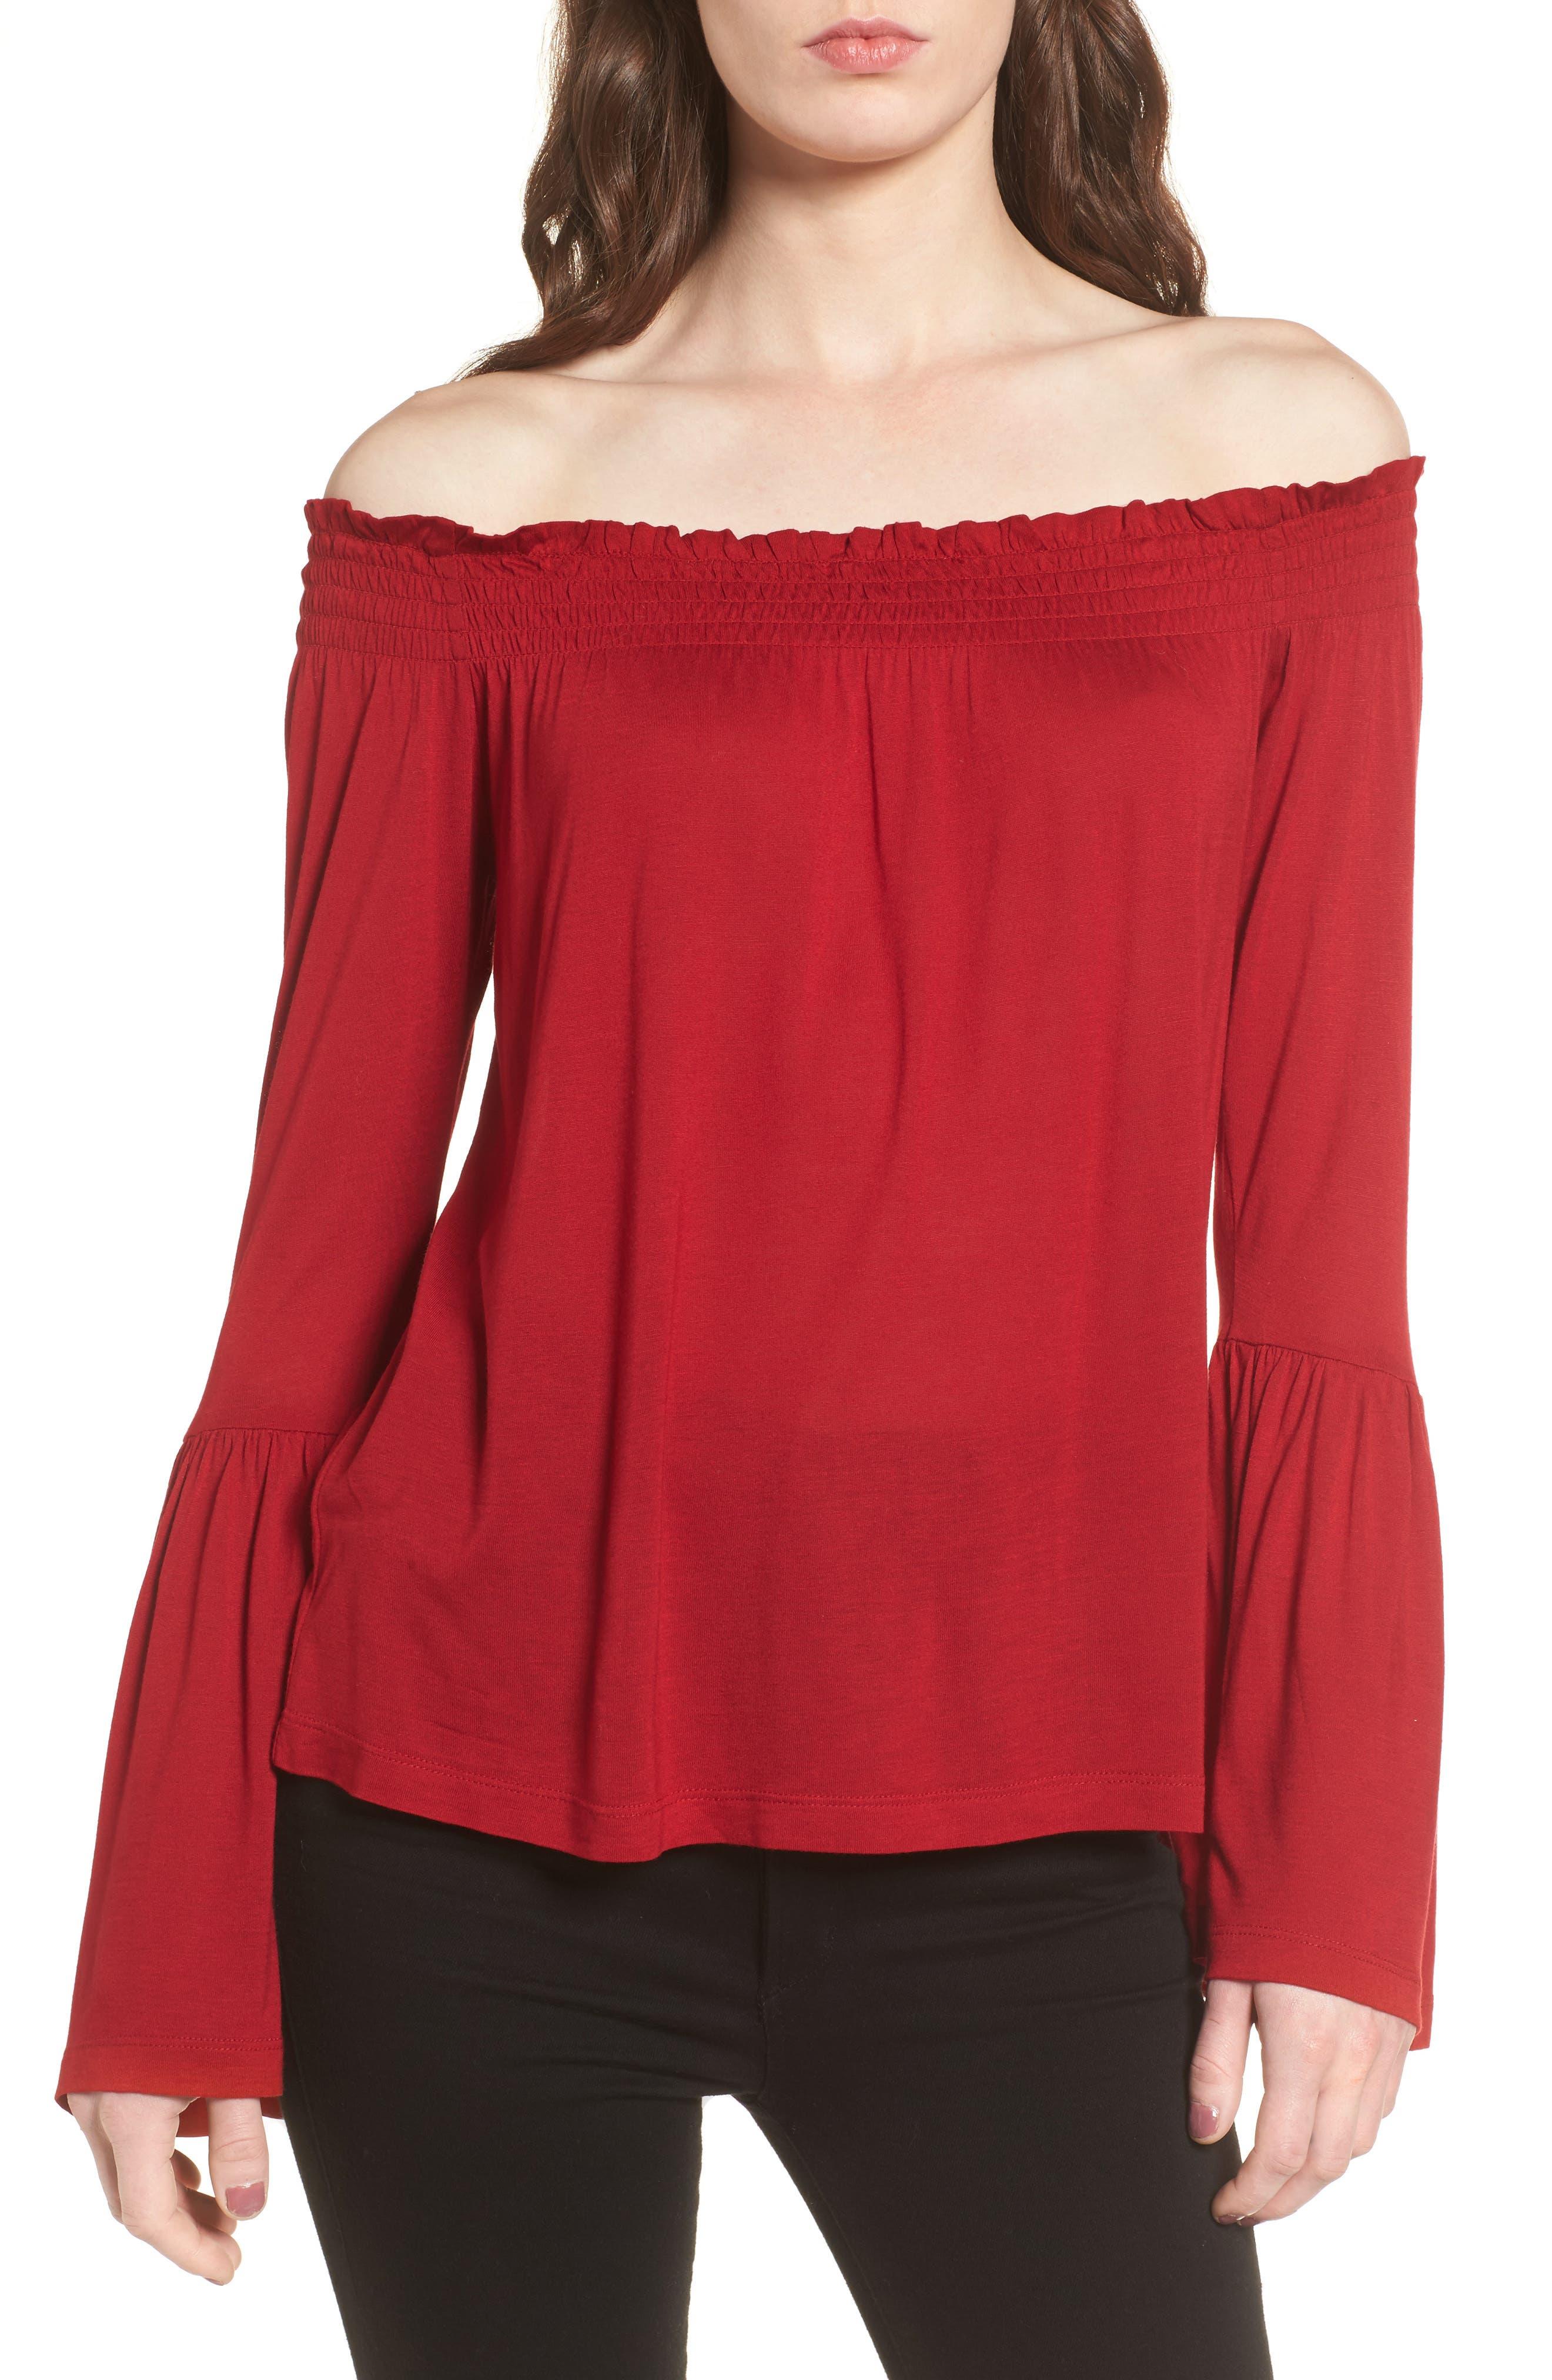 Luck Off the Shoulder Top,                         Main,                         color, Crimson